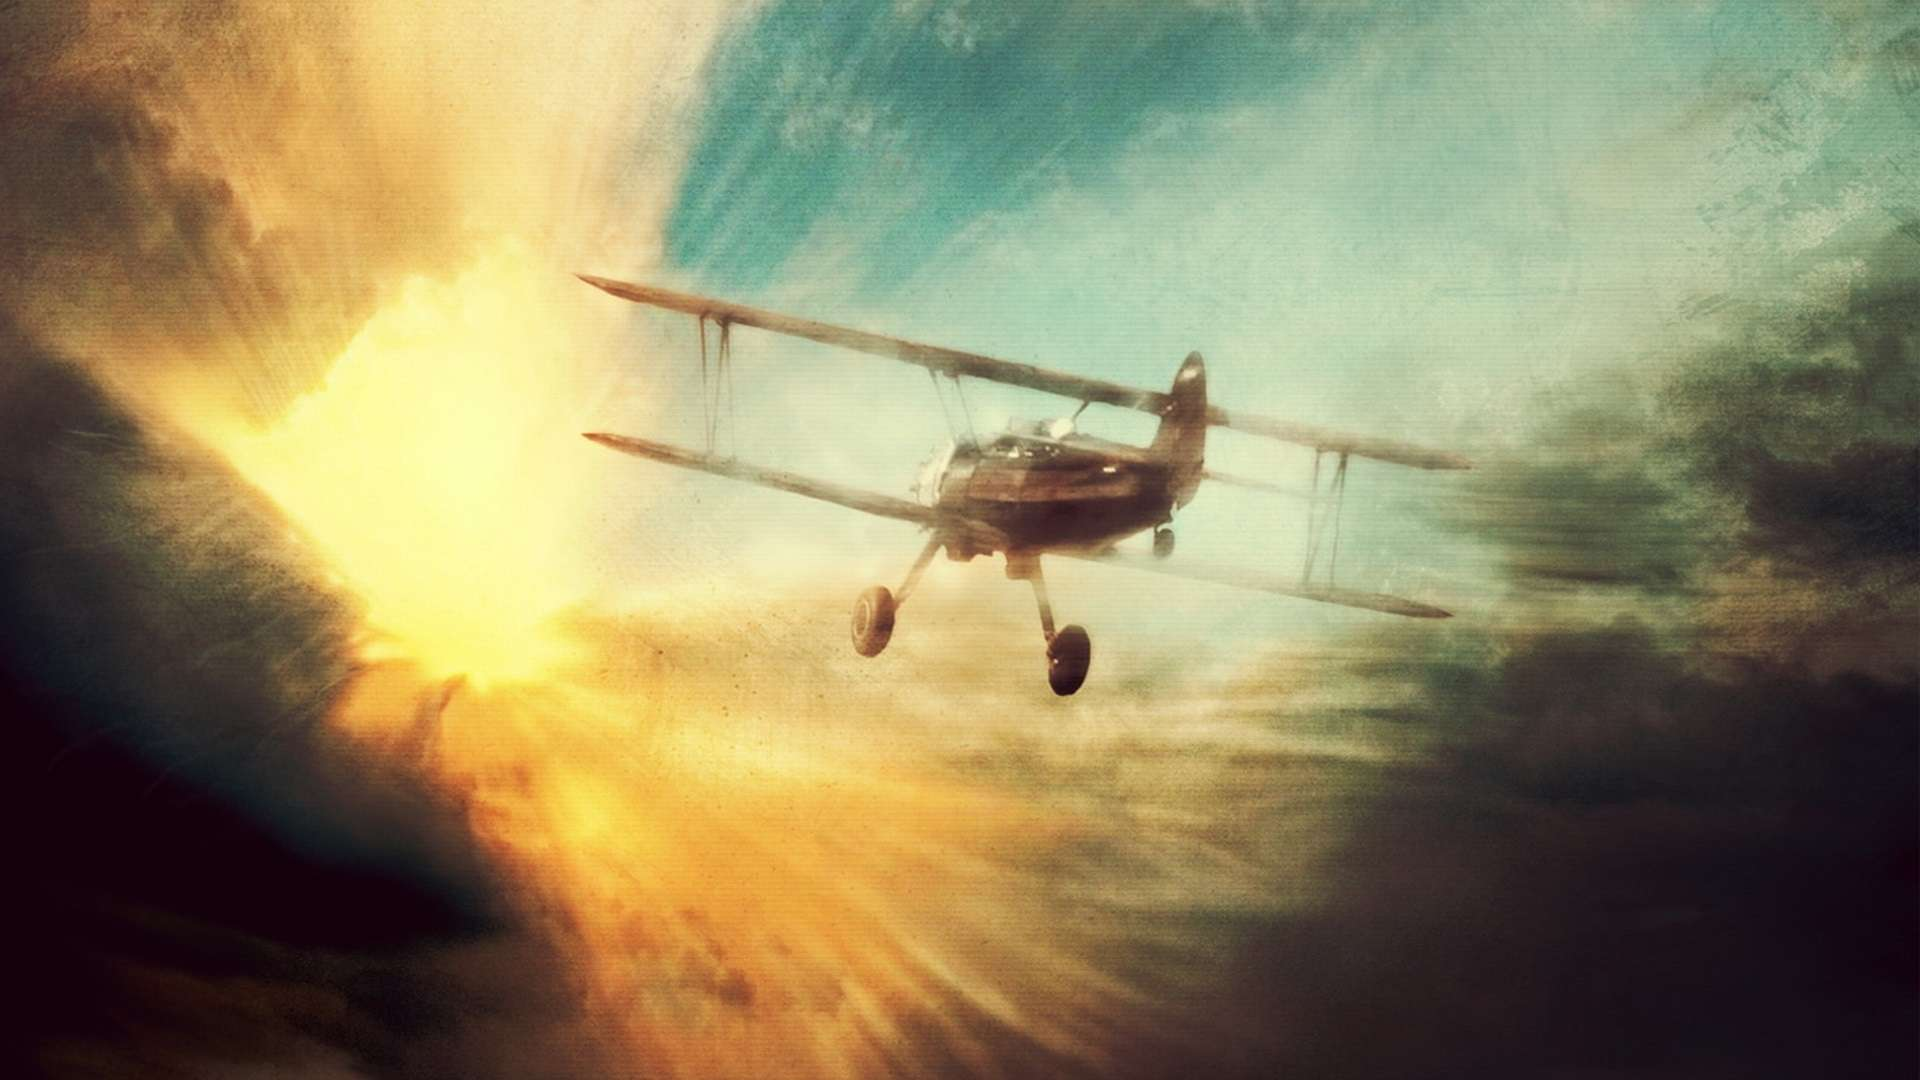 Aircraft Wallpaper 086